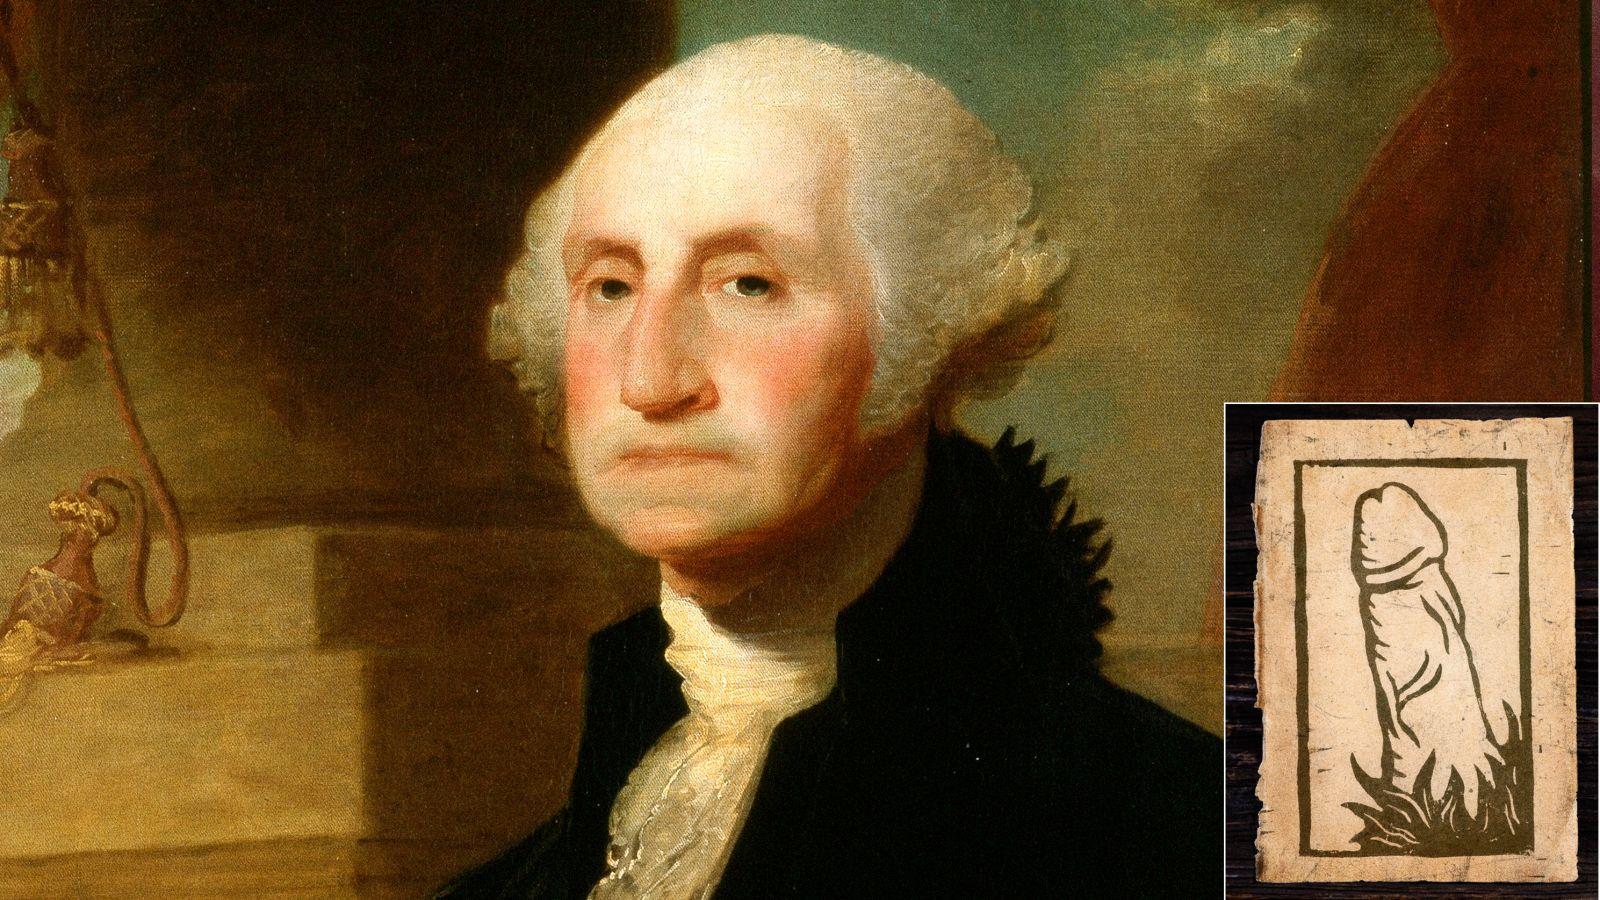 New Evidence Suggests President George Washington Sent Woodcut Of Penis To Secretary https://t.co/jiDP7i4OEO https://t.co/Hci1HesMPG